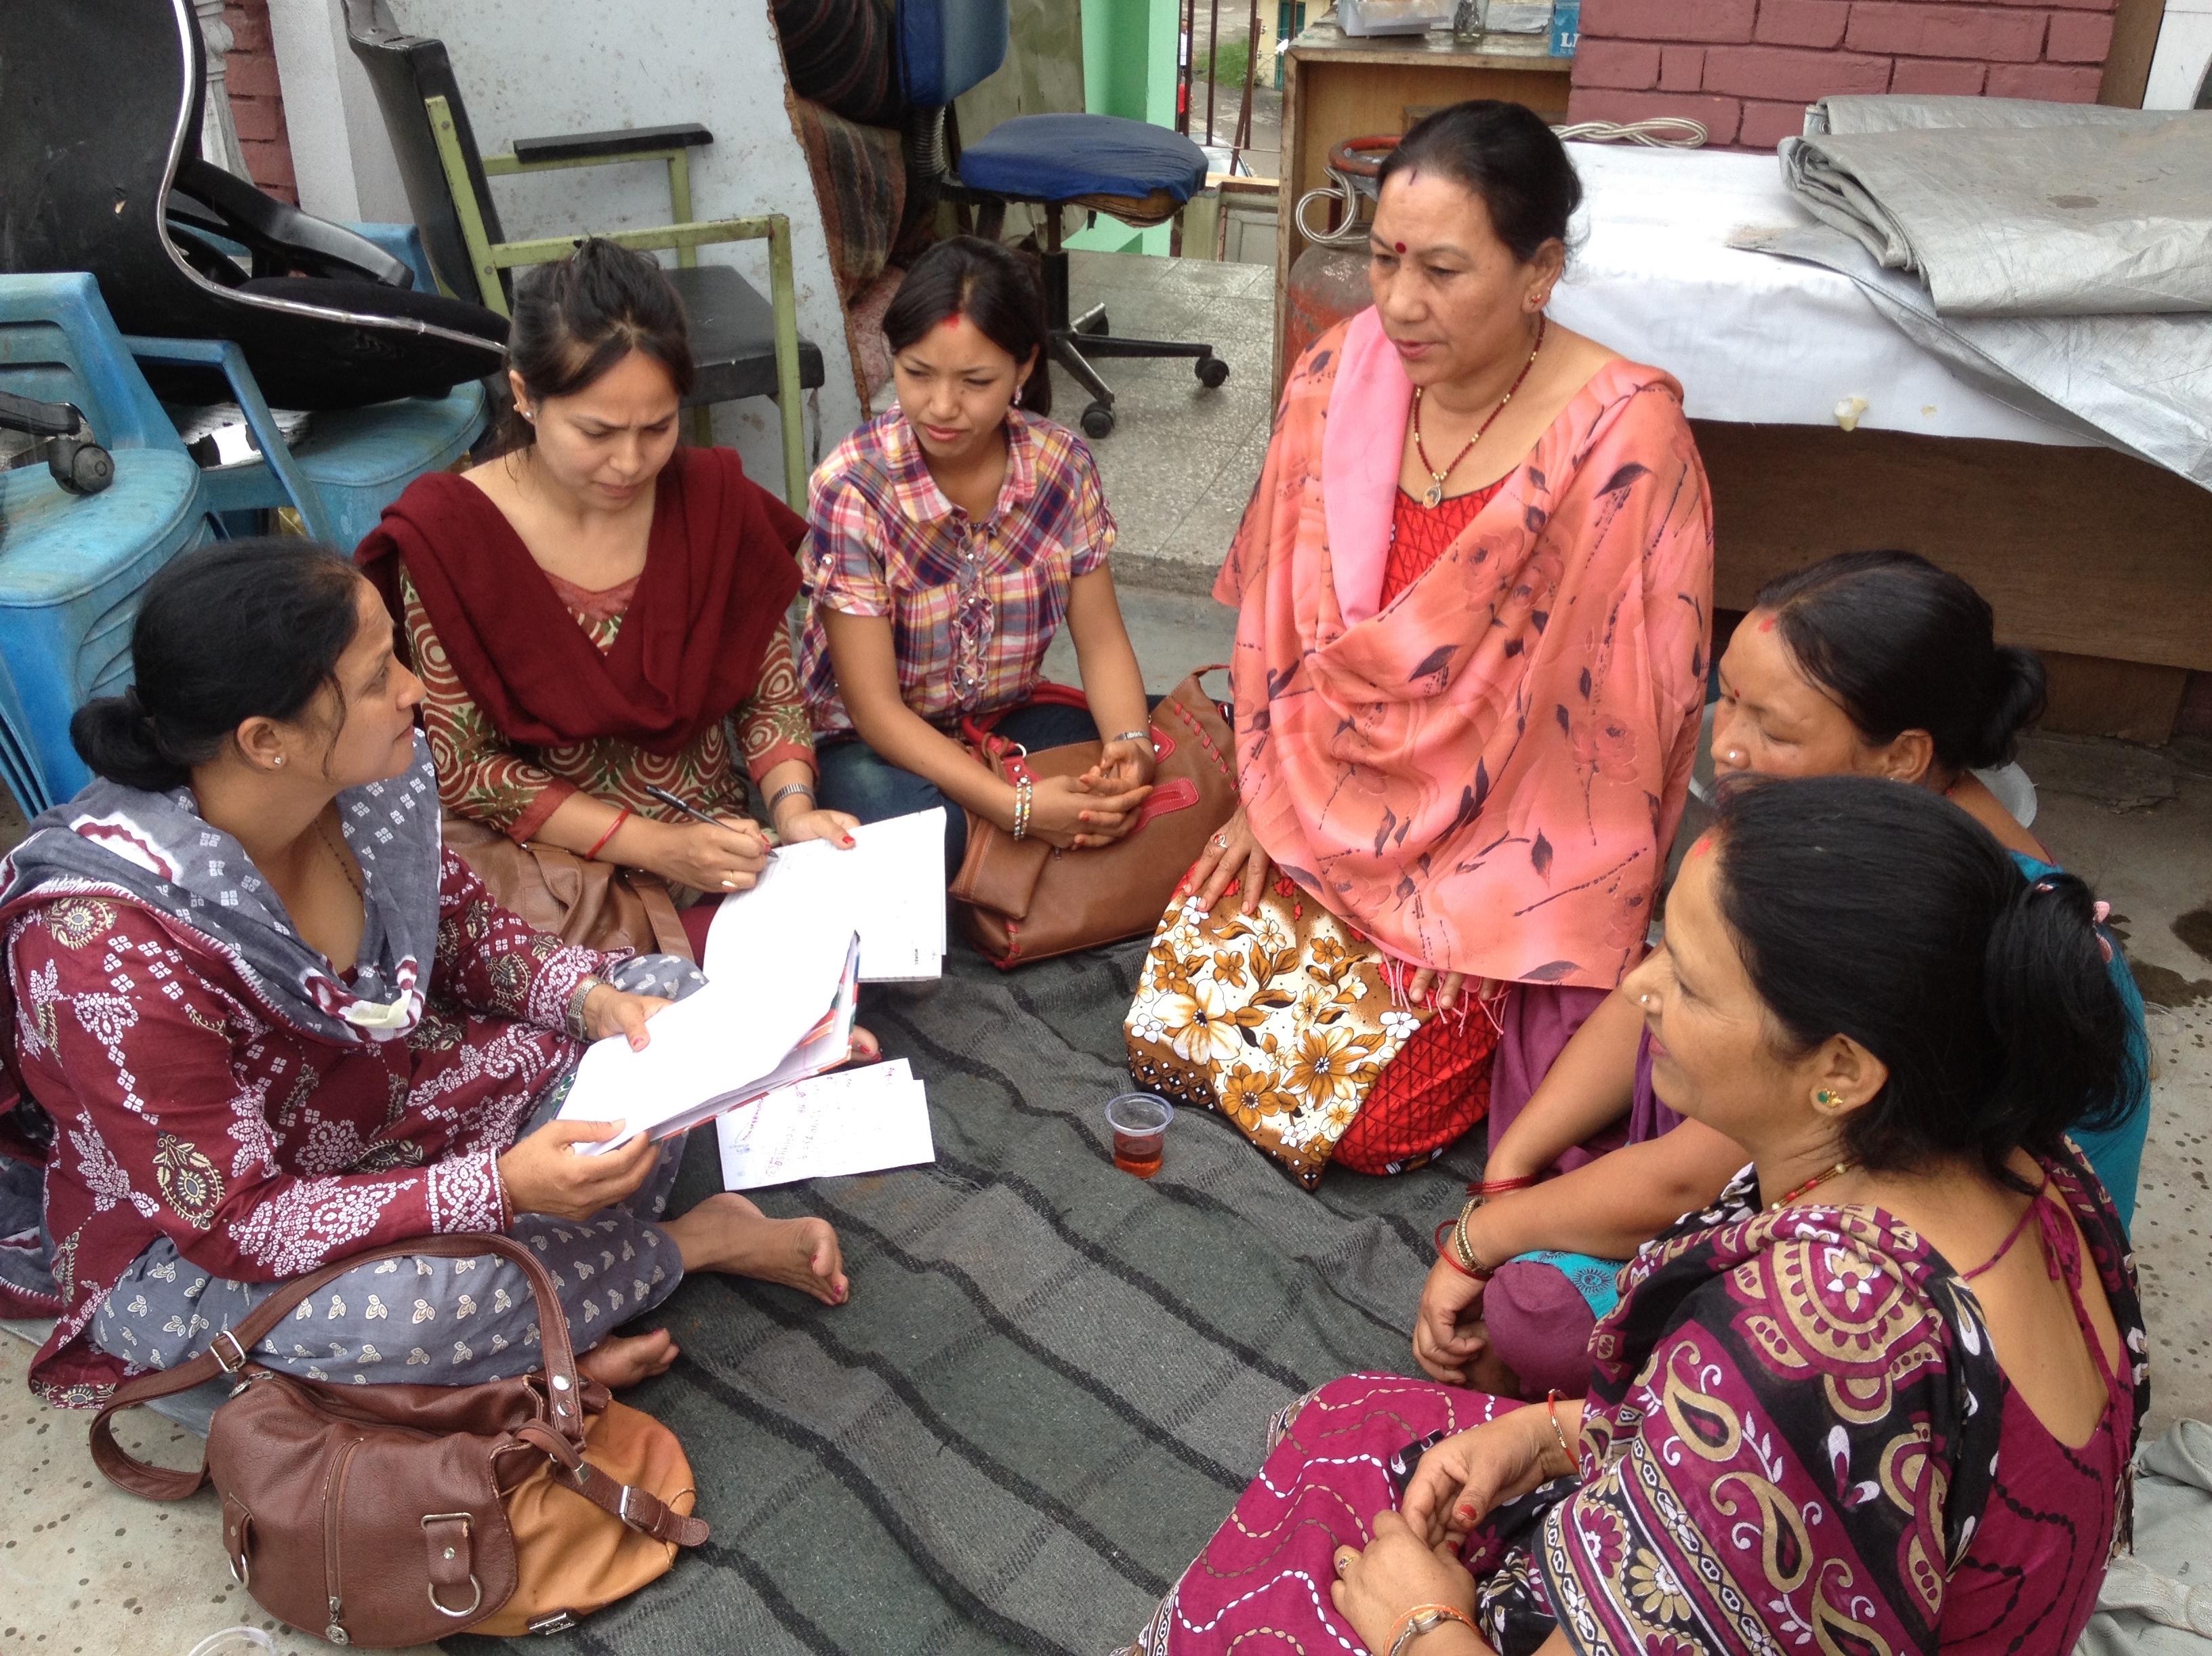 Women discussing international surrogacy